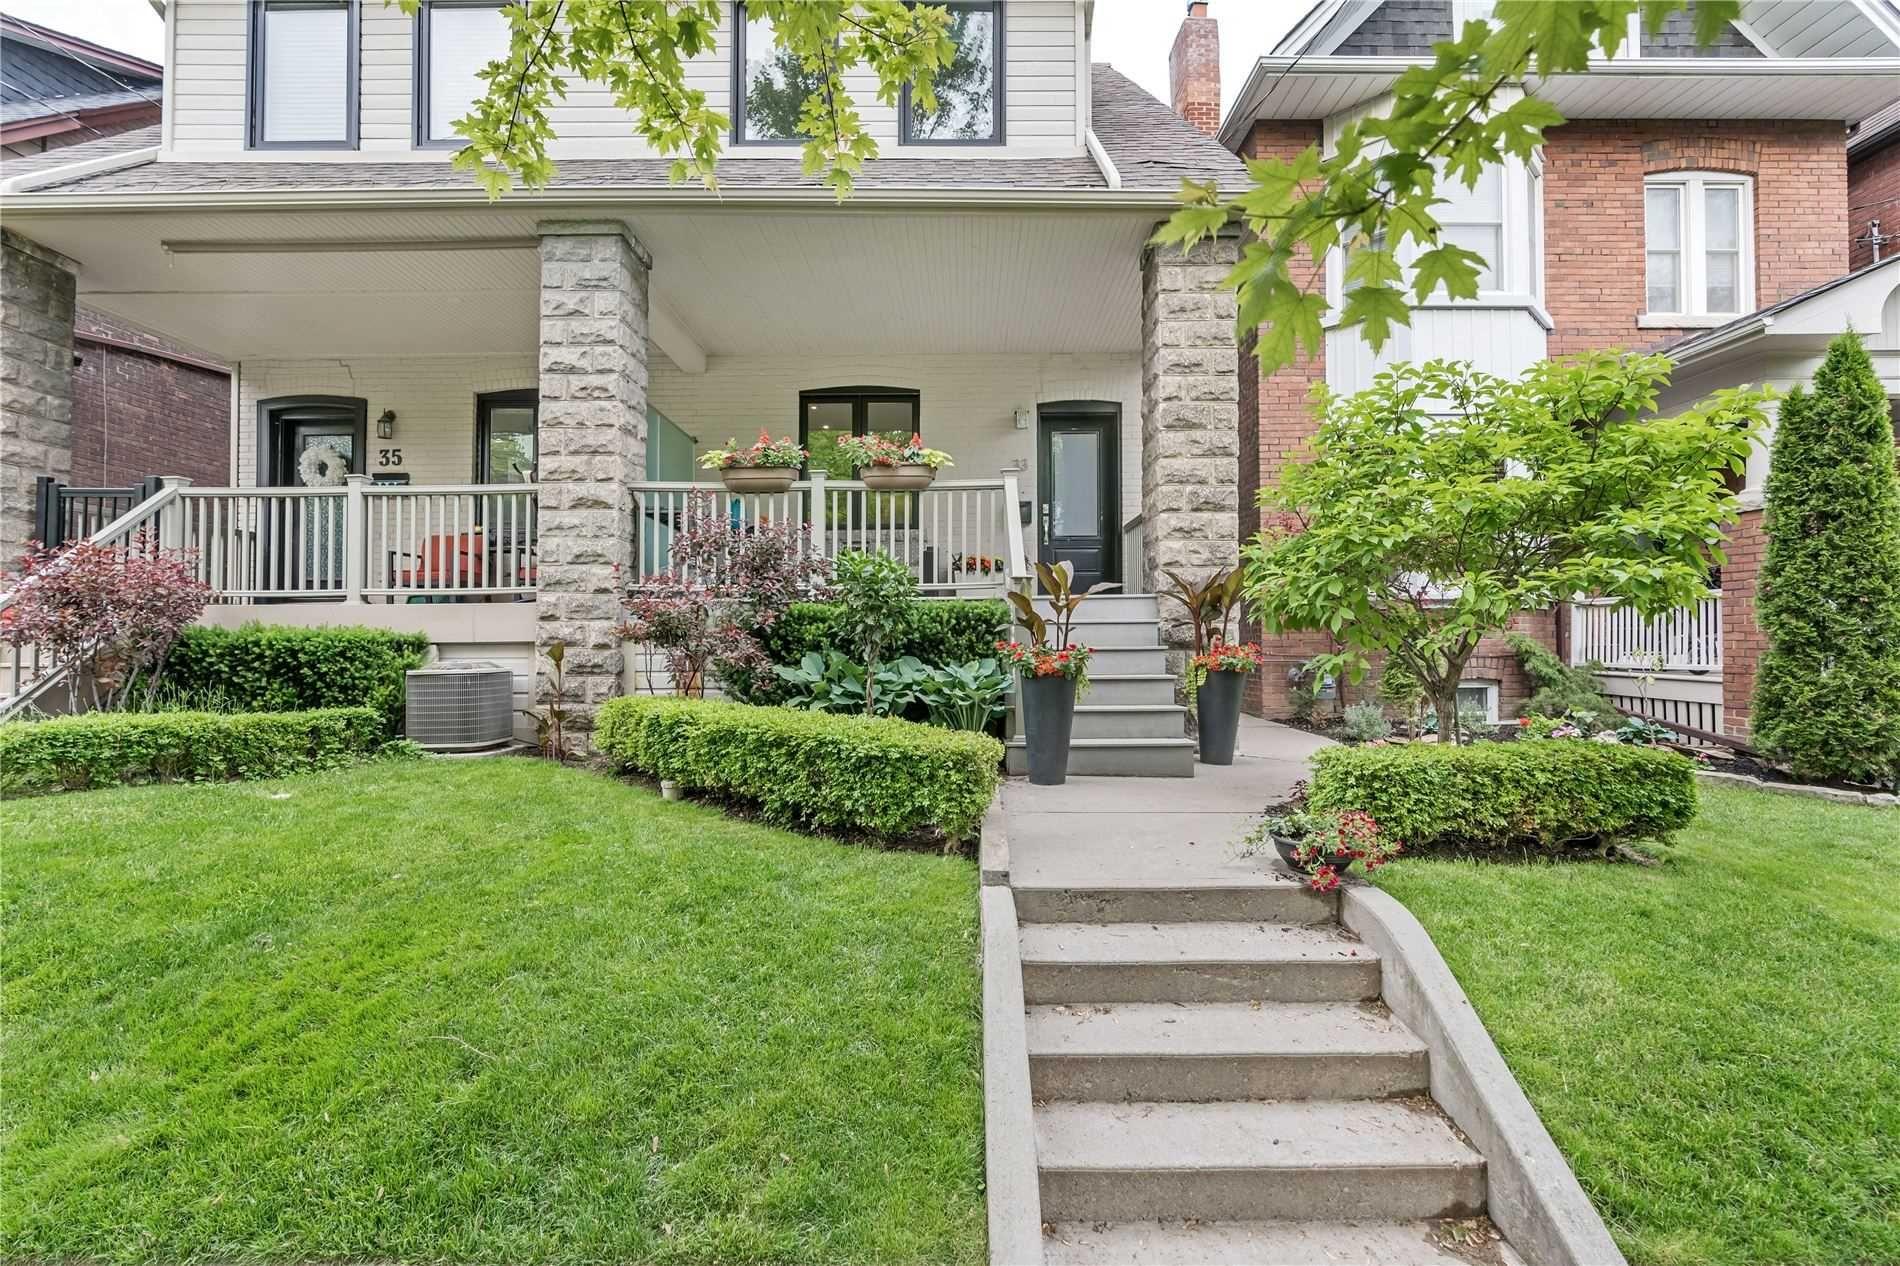 Main Photo: 33 Lockwood Road in Toronto: The Beaches House (2-Storey) for lease (Toronto E02)  : MLS®# E5274503